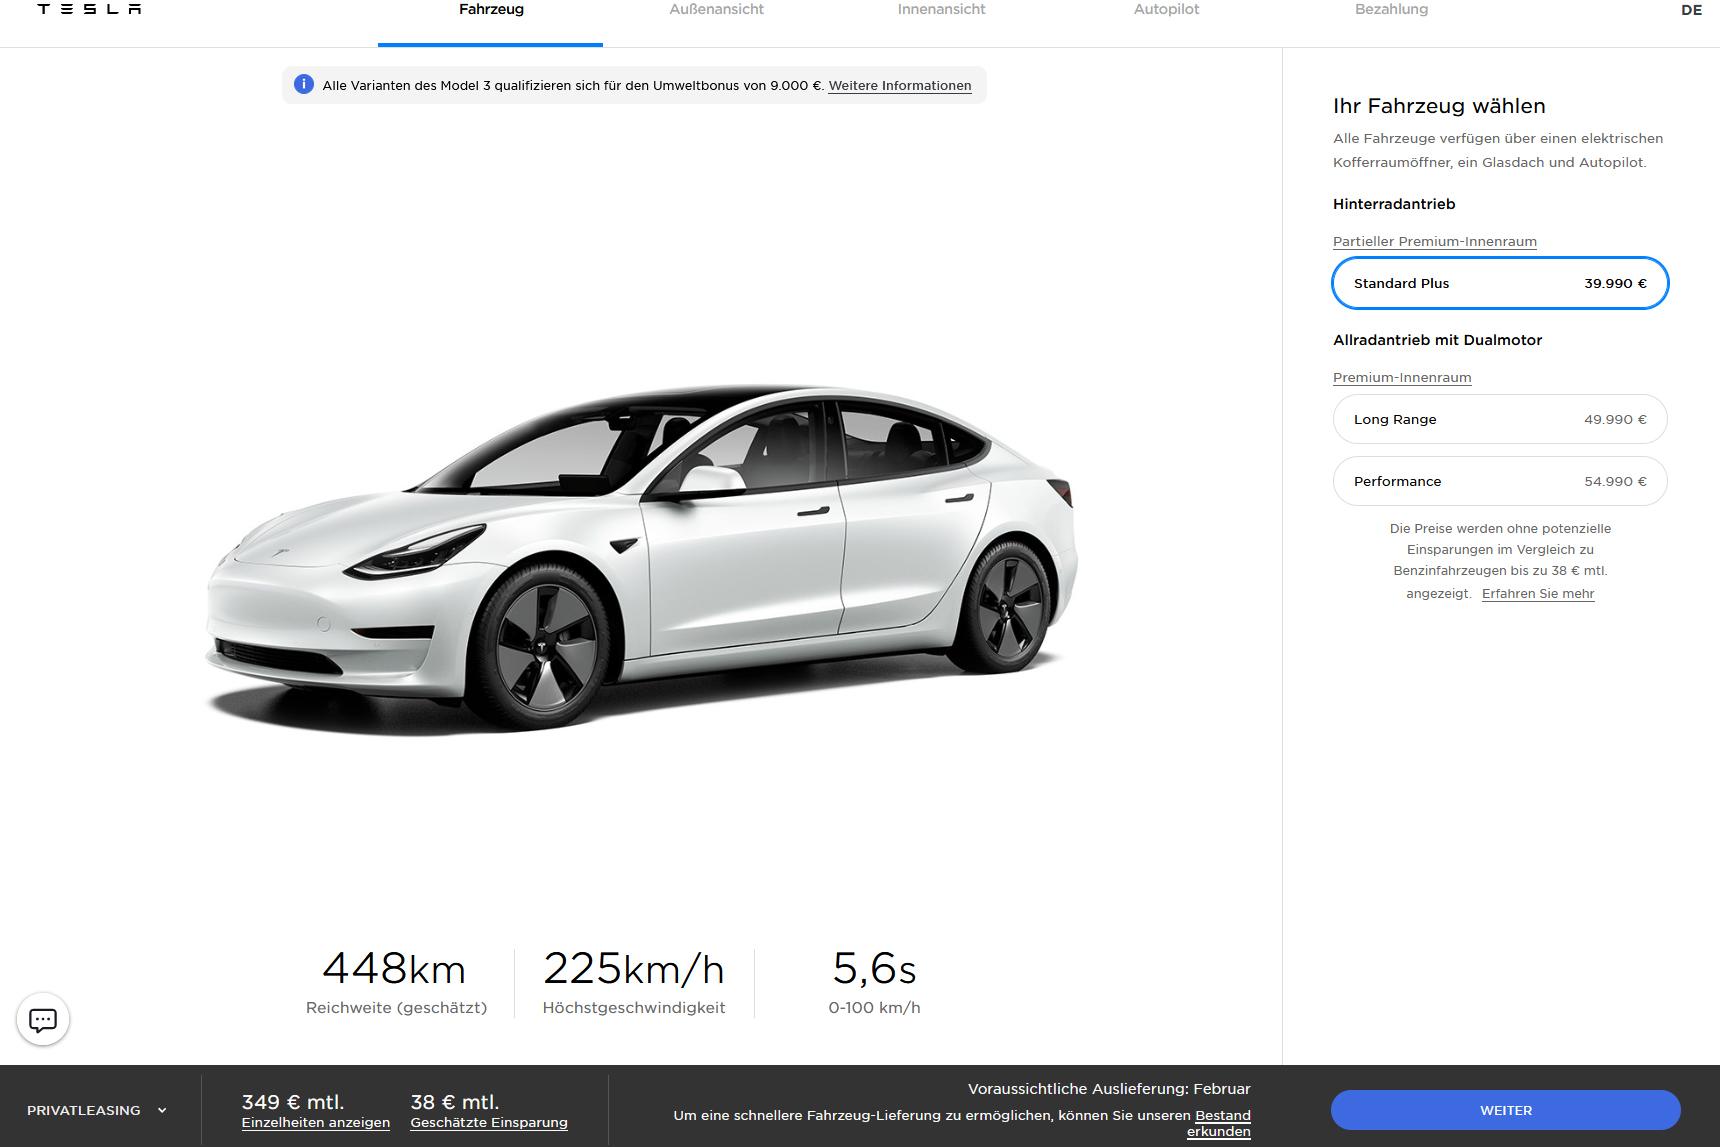 Tesla Model 3 Preis 20 01 2021